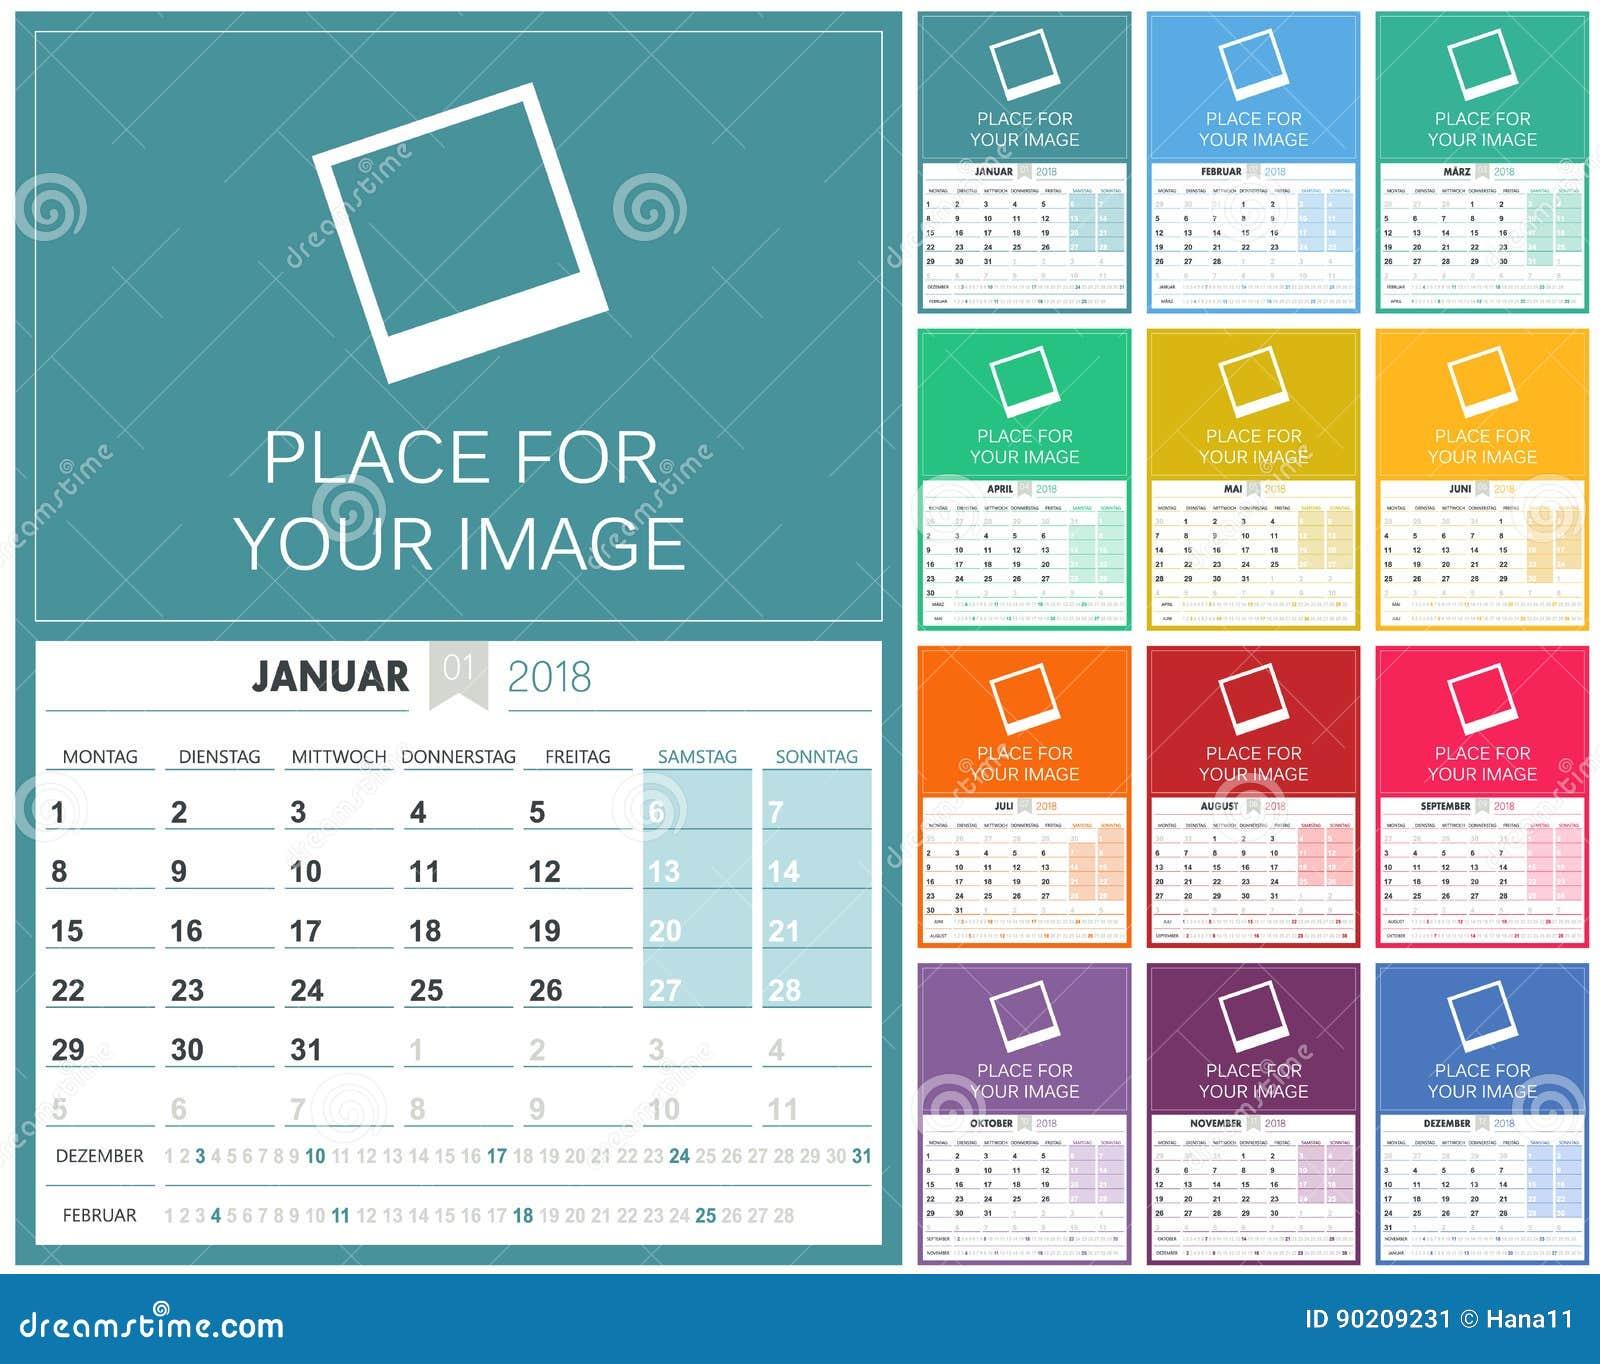 Calendar Illustration Template : German calendar stock vector illustration of graphic